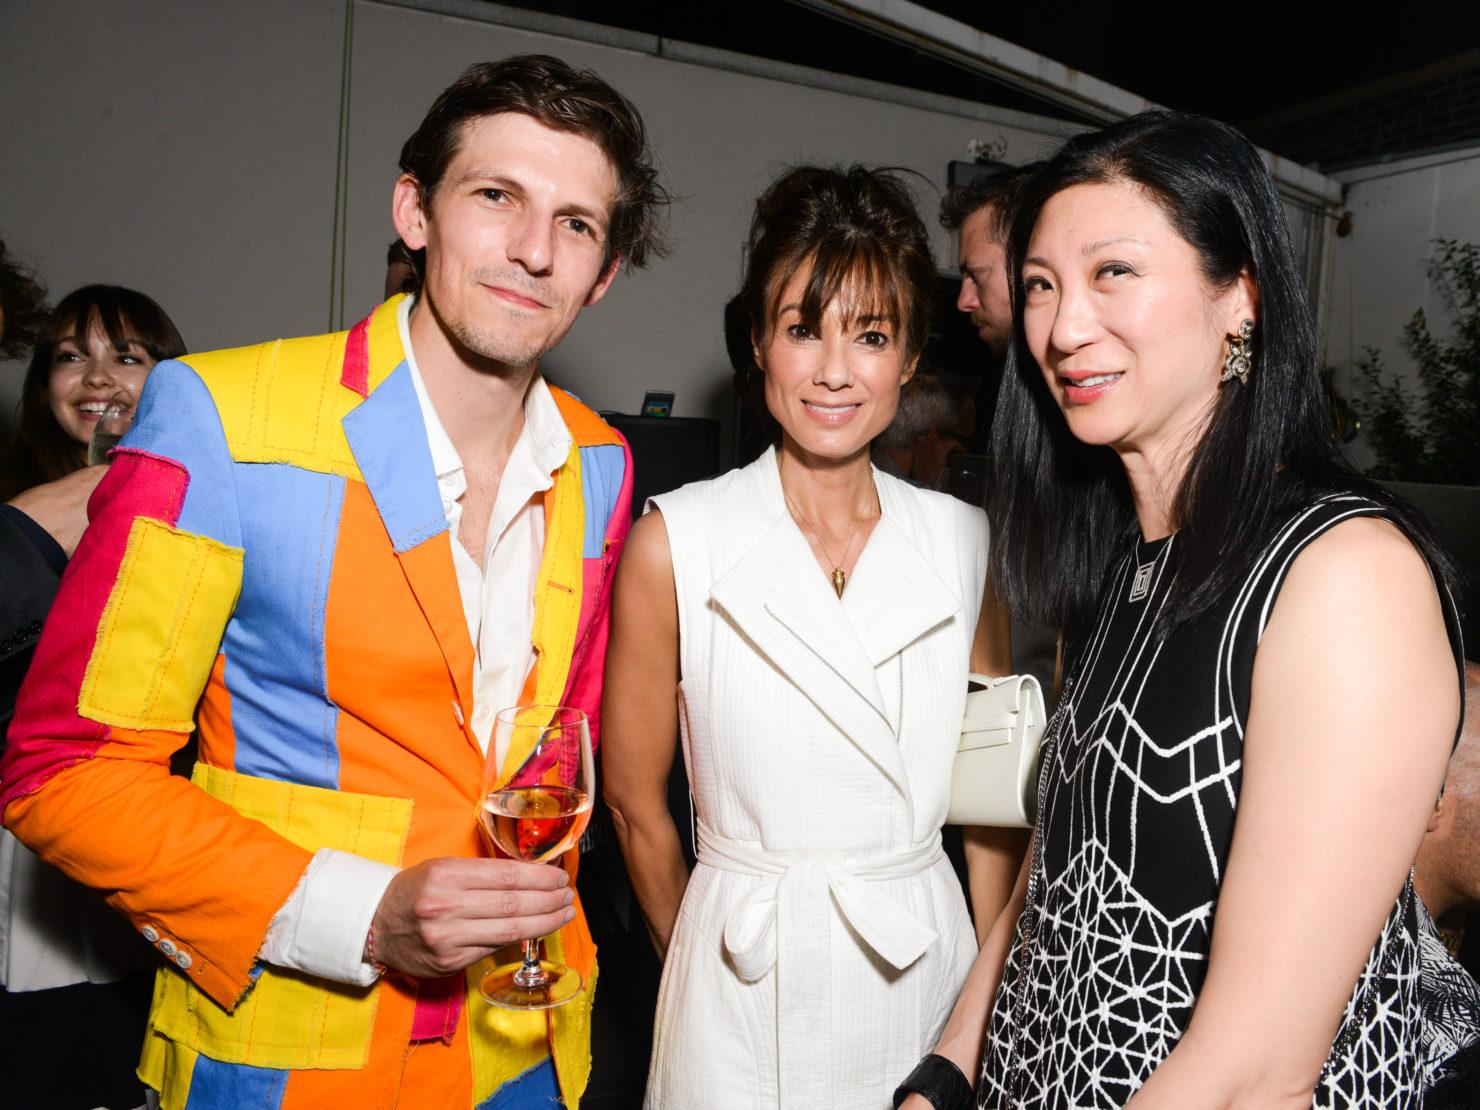 Misha Kahn, Lisa Baquero and Elena Yoon